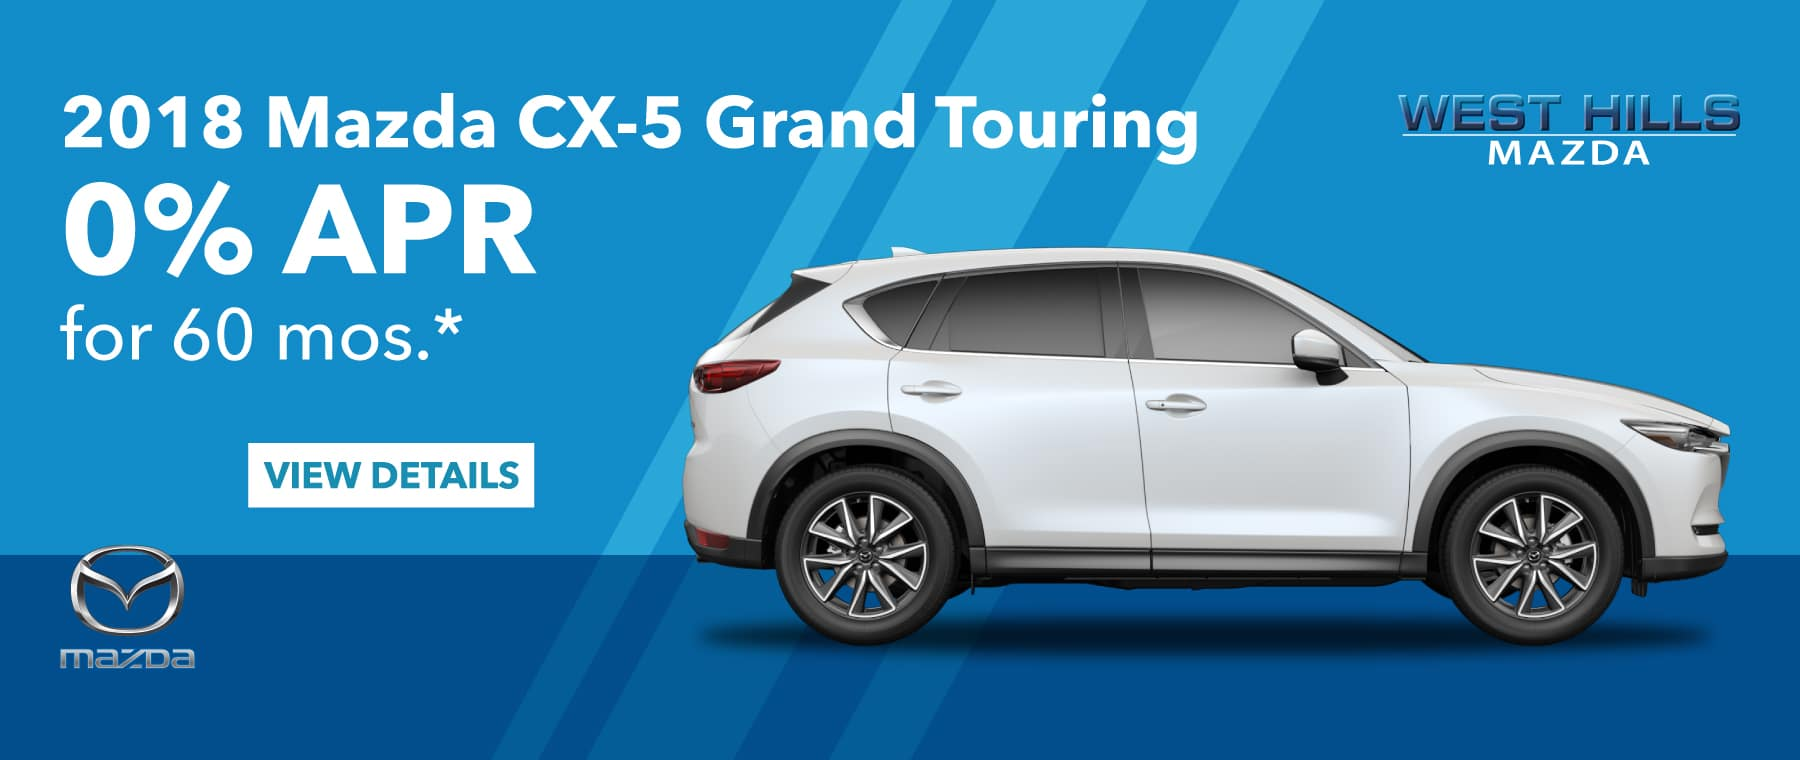 2018 Mazda Cx-5 Grand Touring MSRP: $33,910 Dealership Discount: $1,411 Rebate: $1,000 Sale Price: 31,499*